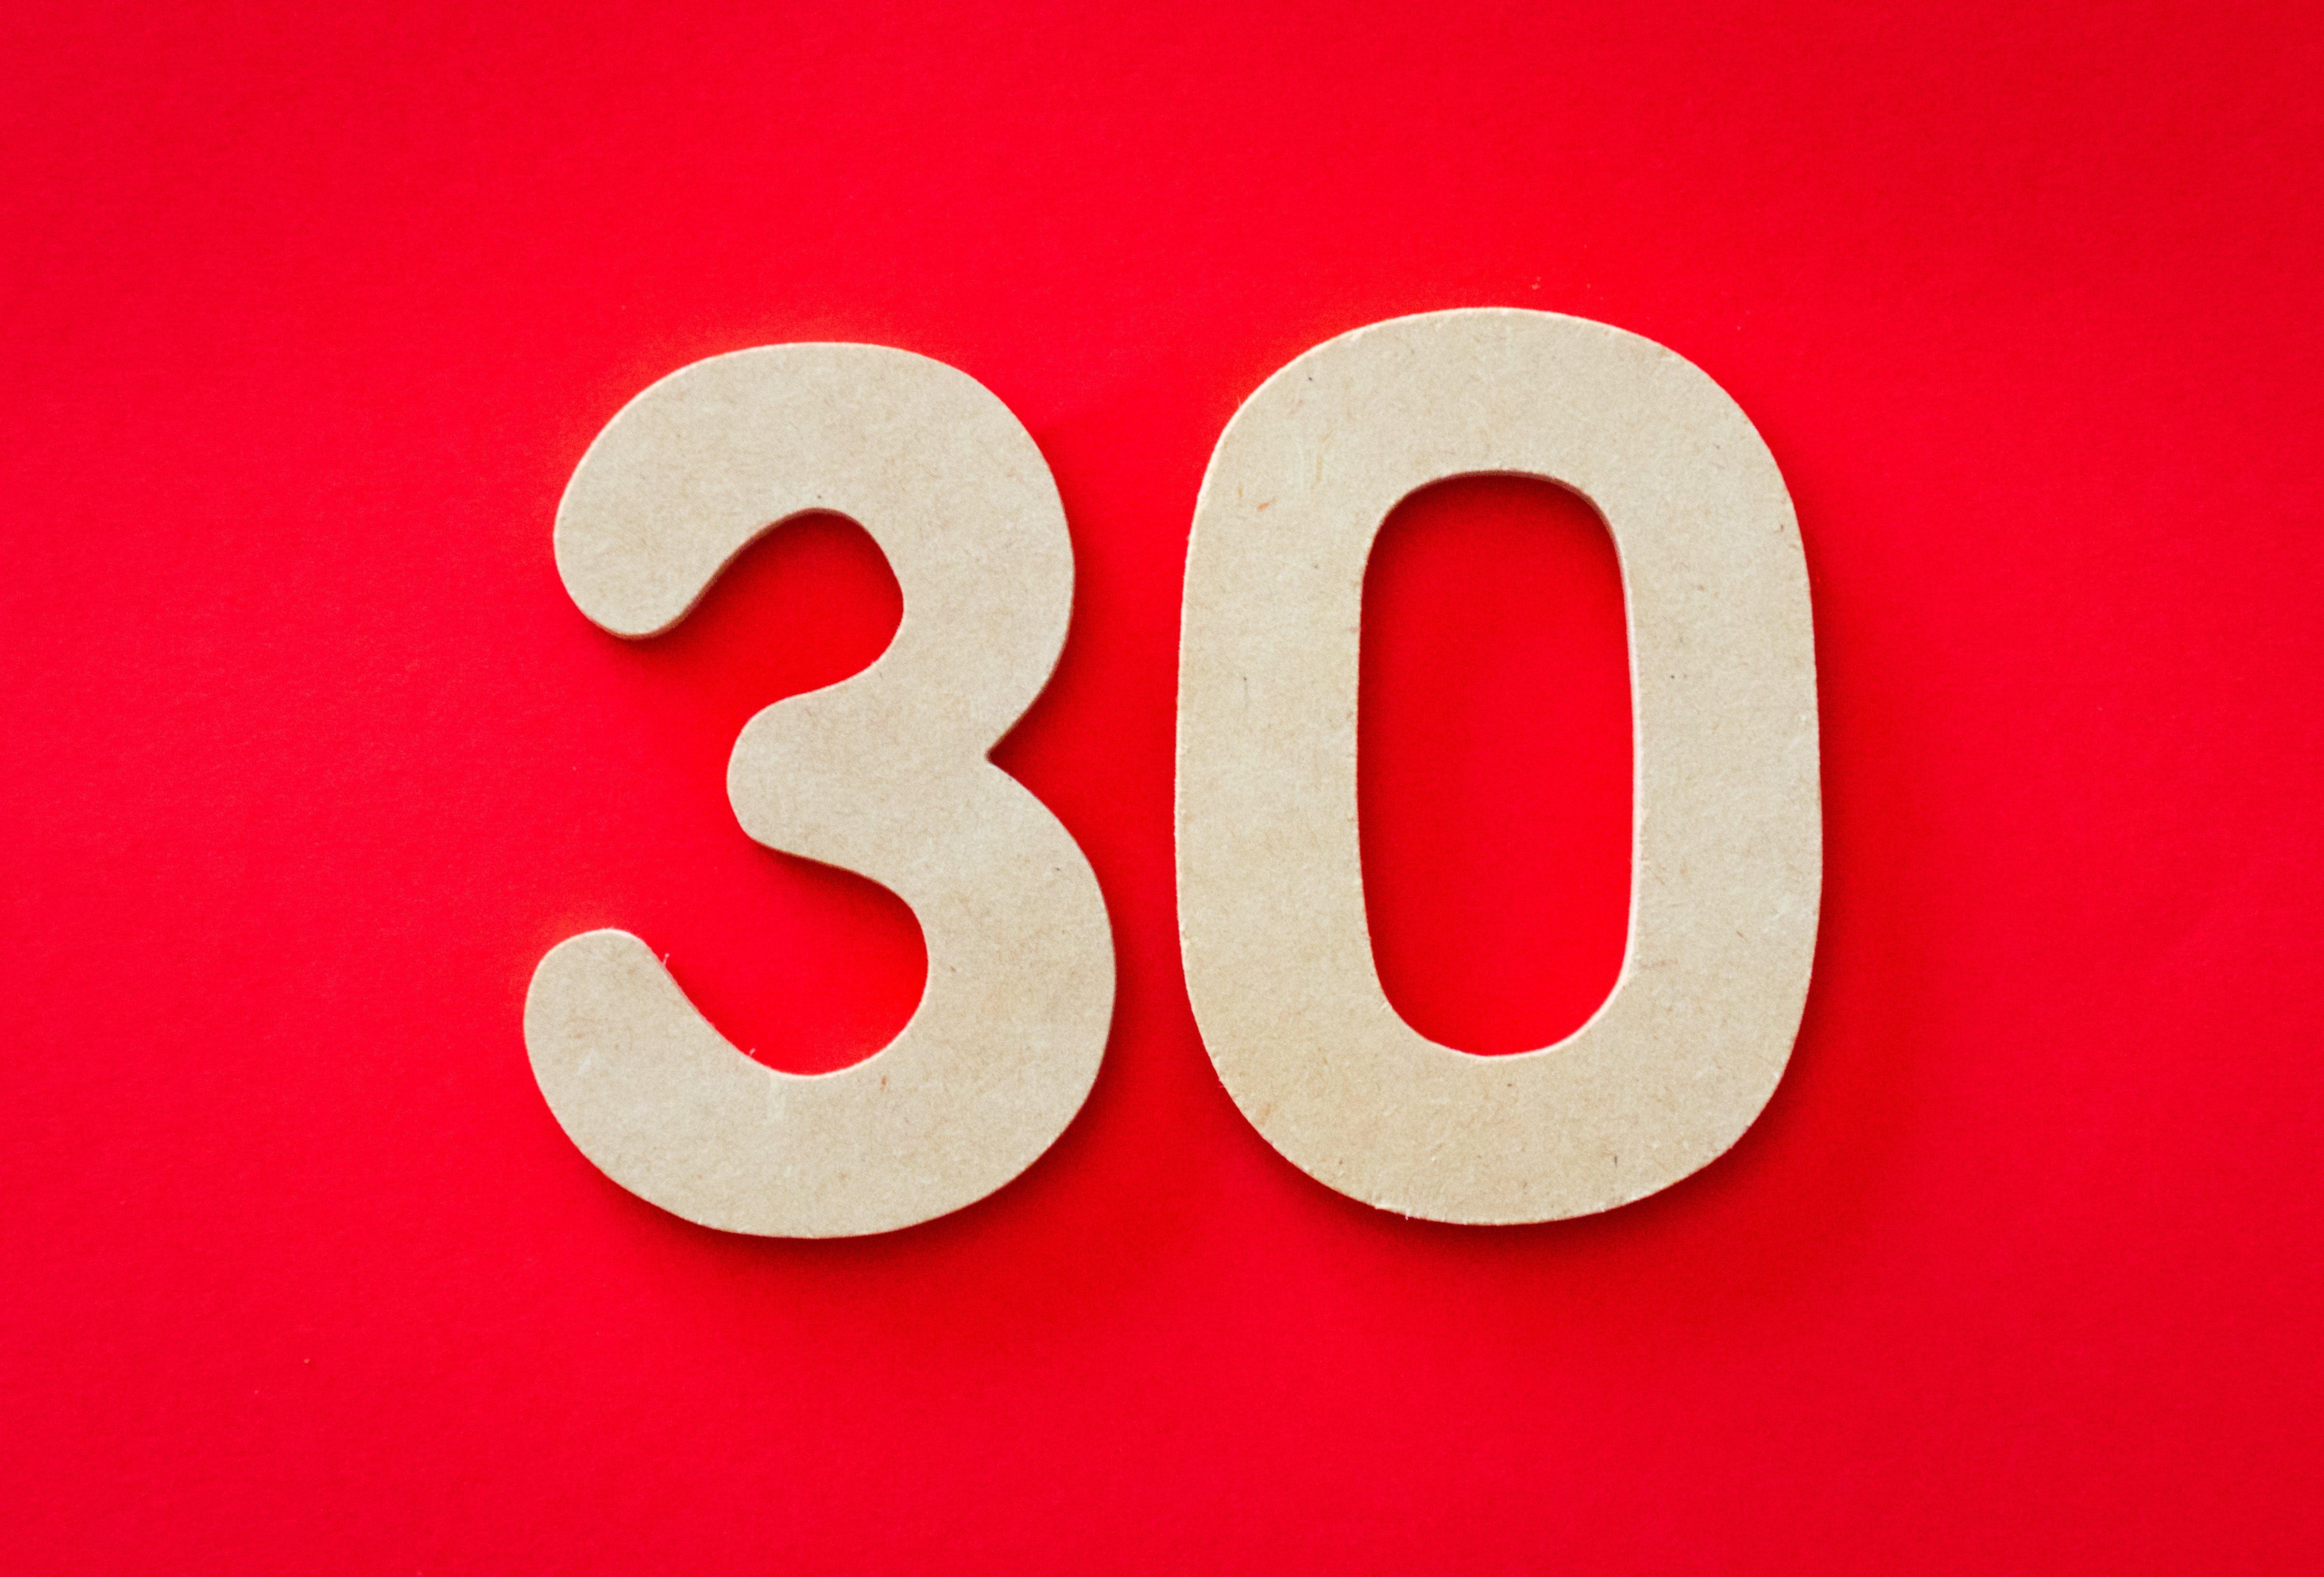 30, aprendre, art